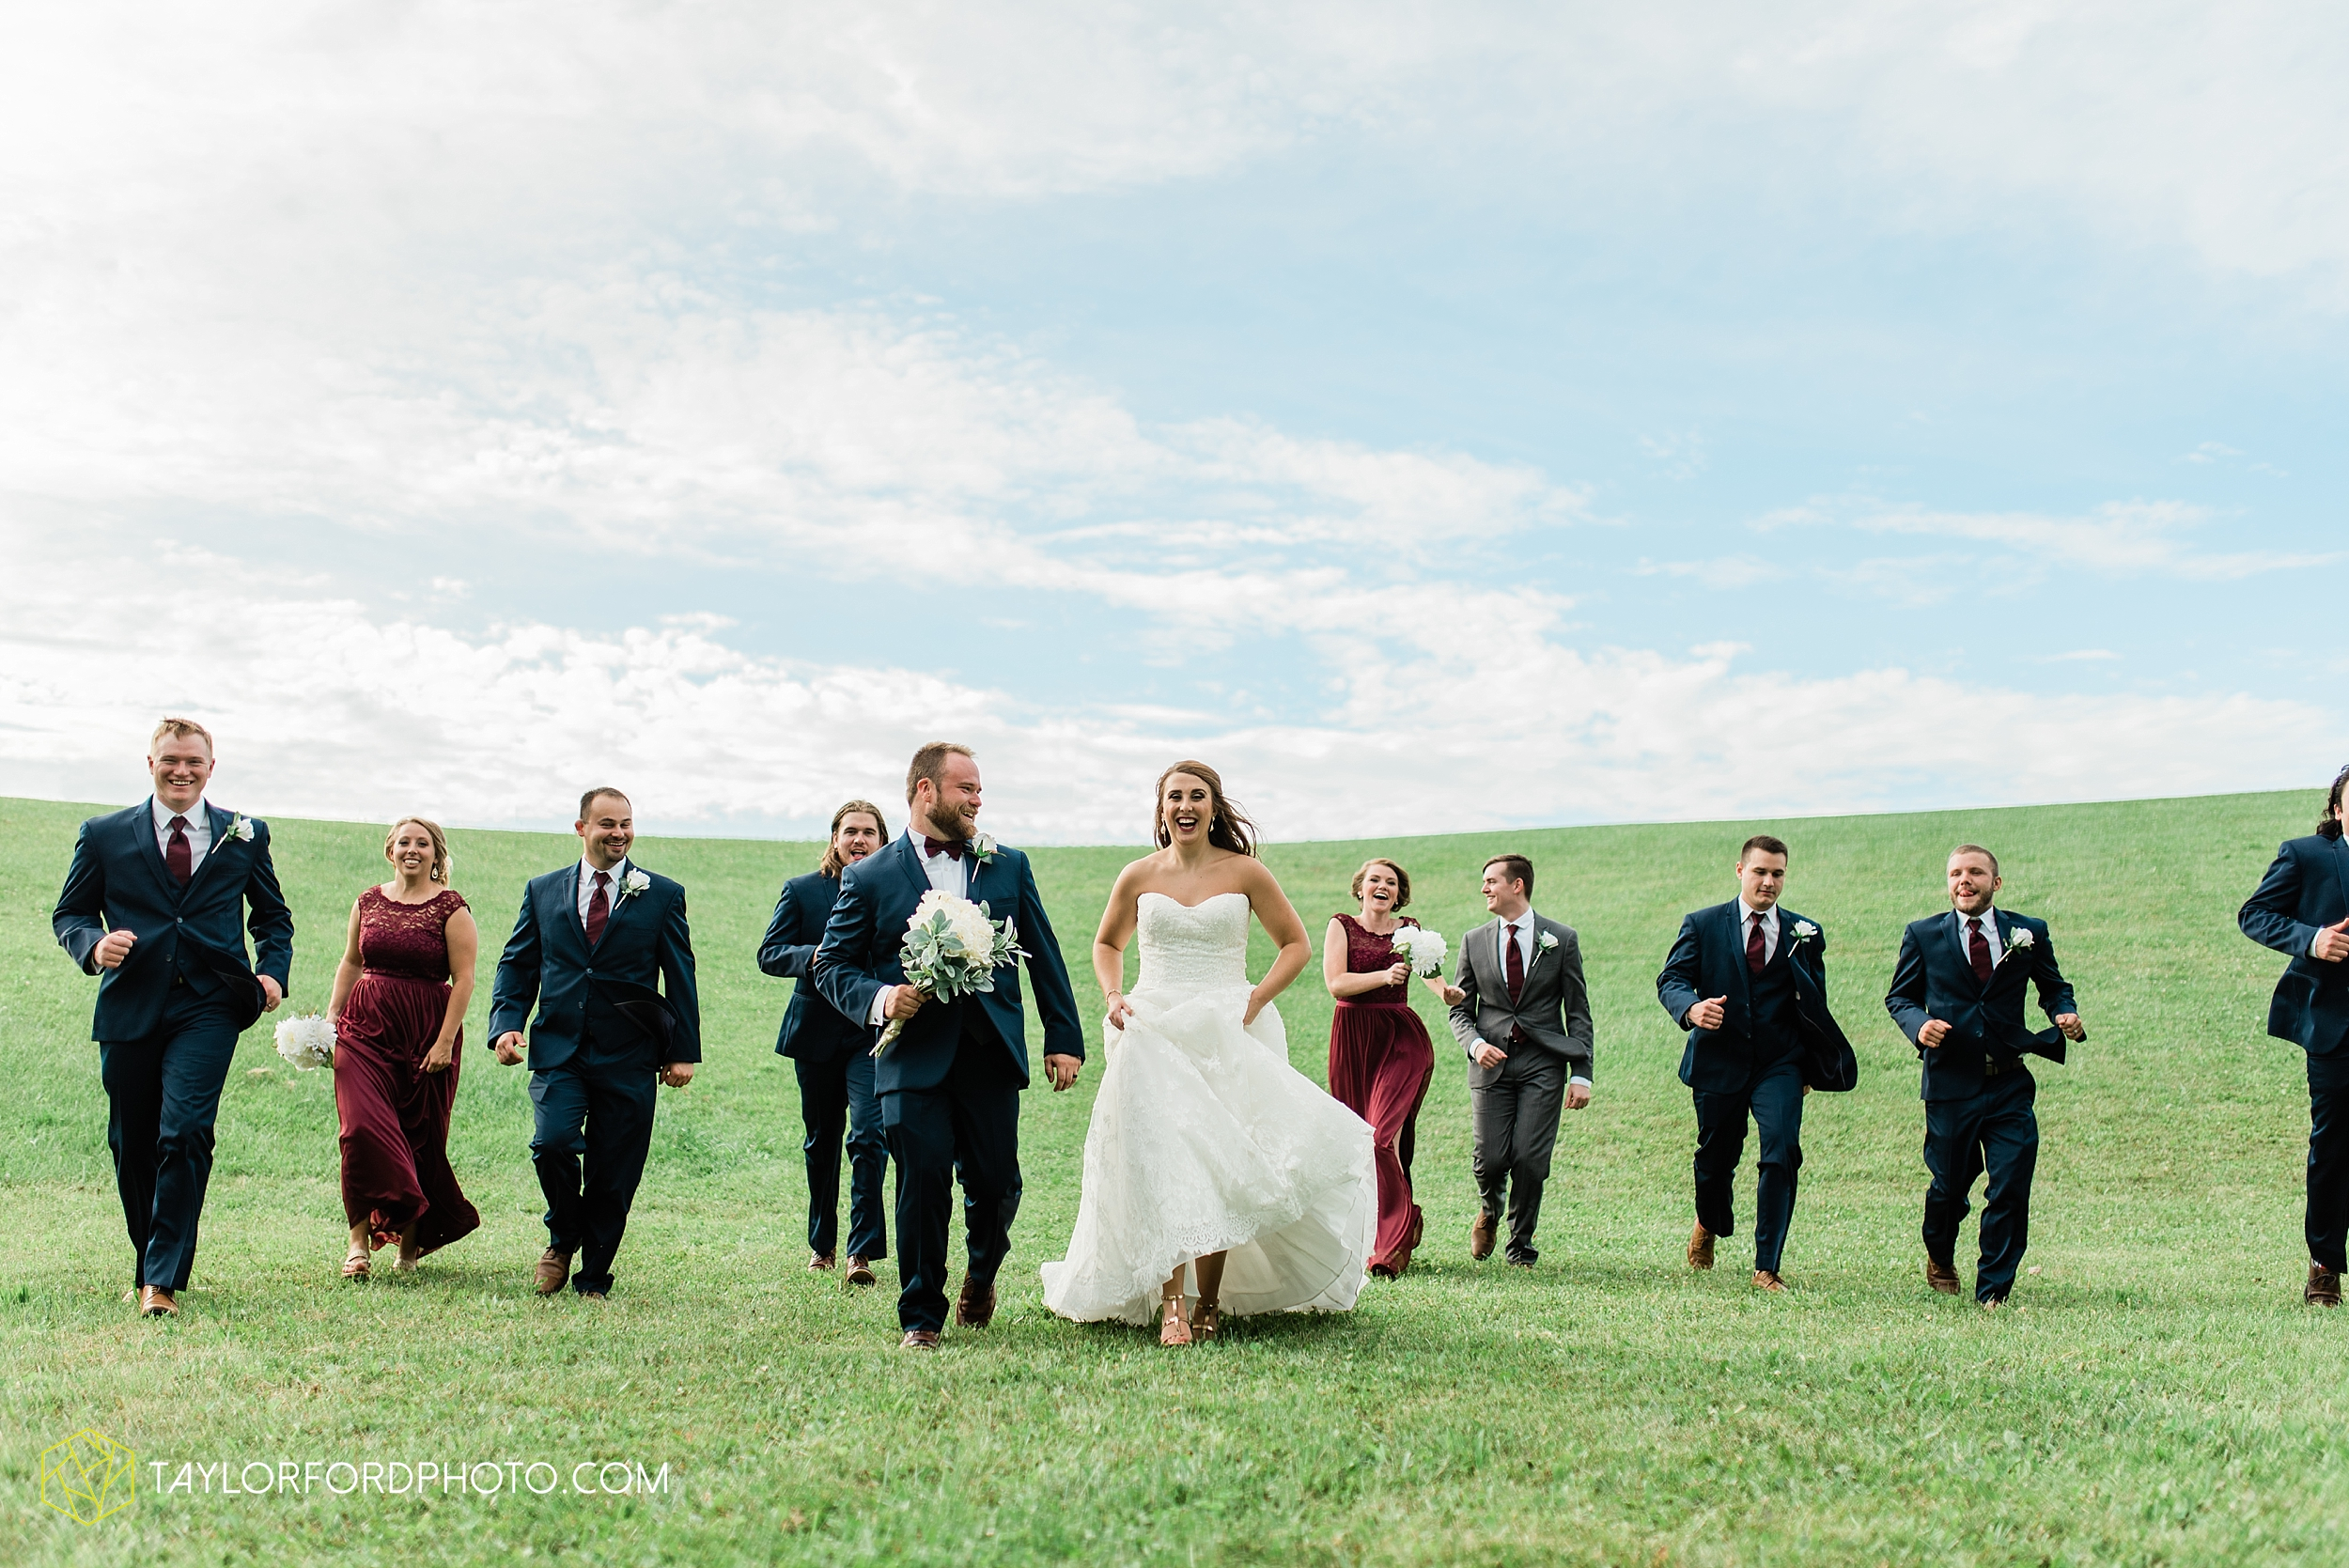 chelsey-zosh-jackson-young-first-united-methodist-church-senior-center-van-wert-ohio-wedding-photographer-taylor-ford-photography_0078.jpg